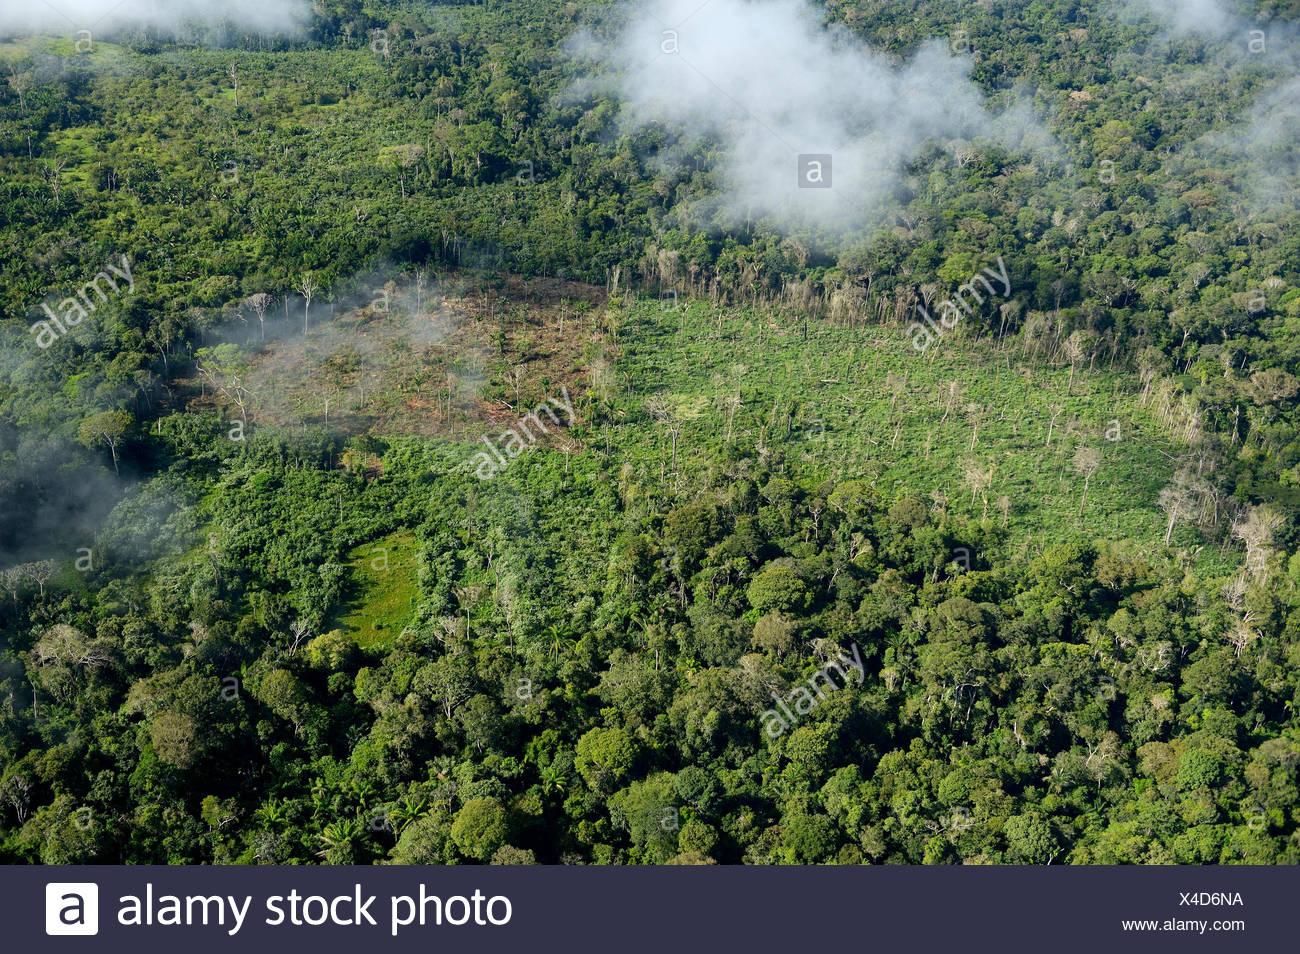 Brazil, Para, Itaituba, Amazon rainforest, slash and burn, reclamation of pastureland - Stock Image